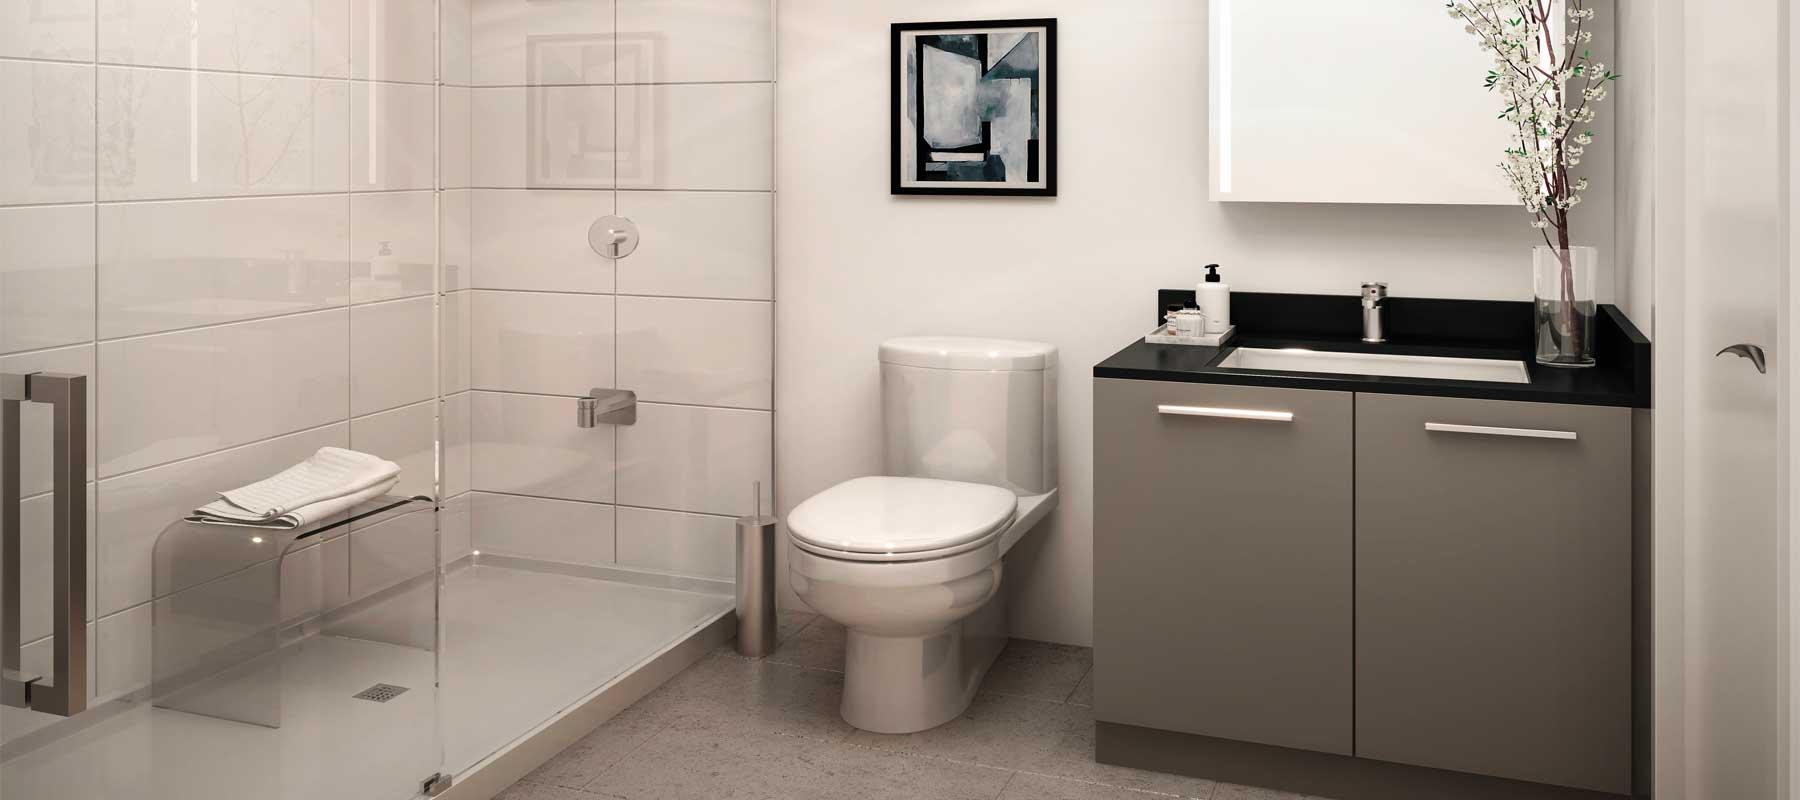 Suite bathroom rendering of Sixty-Five Broadway Condos.